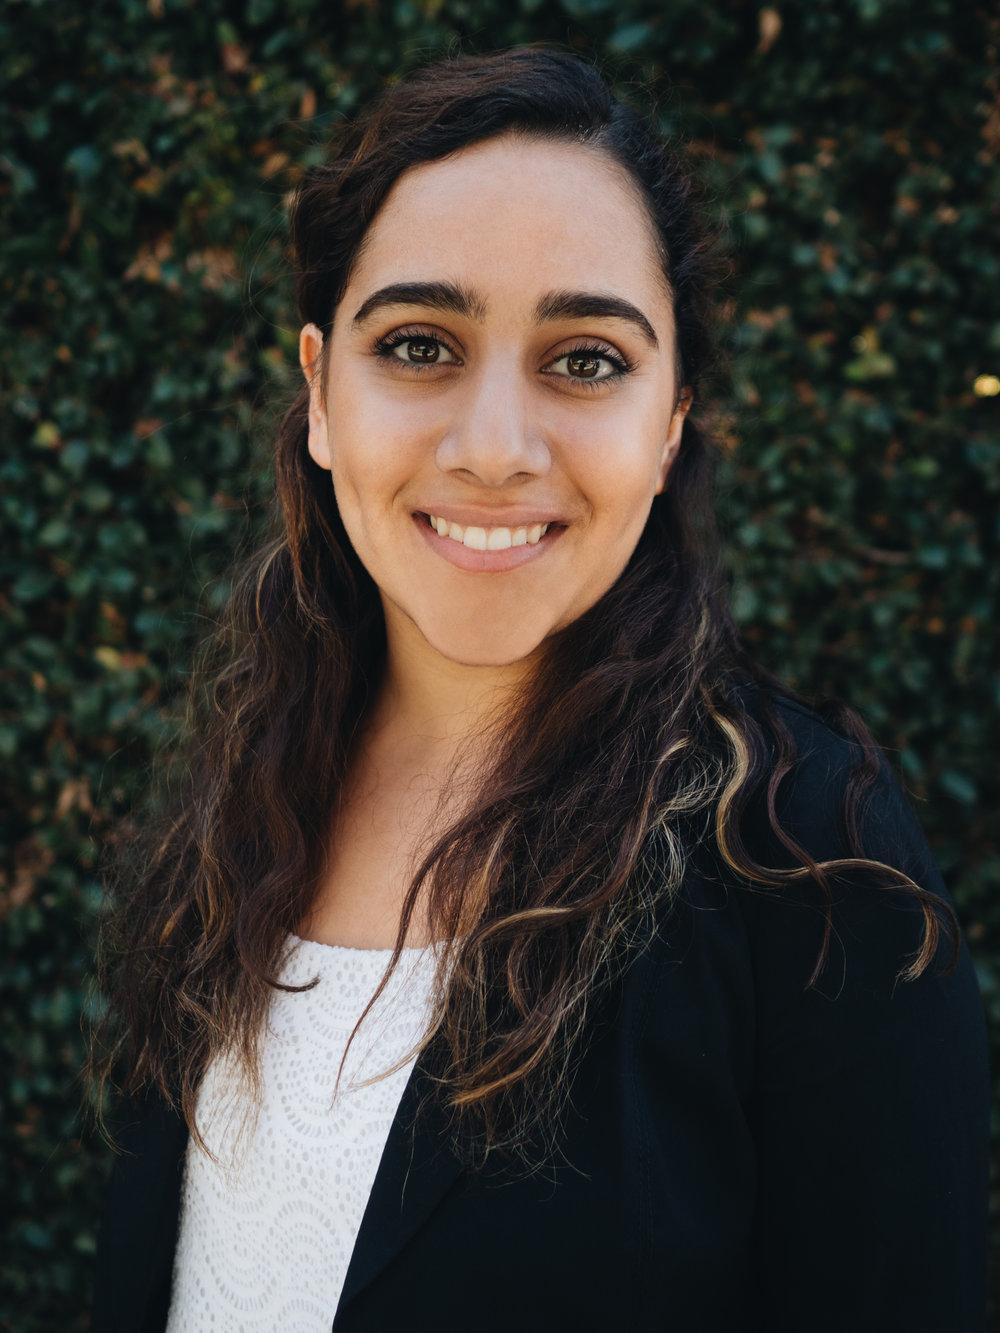 Ava Aslanpour,Bioengineering Intern